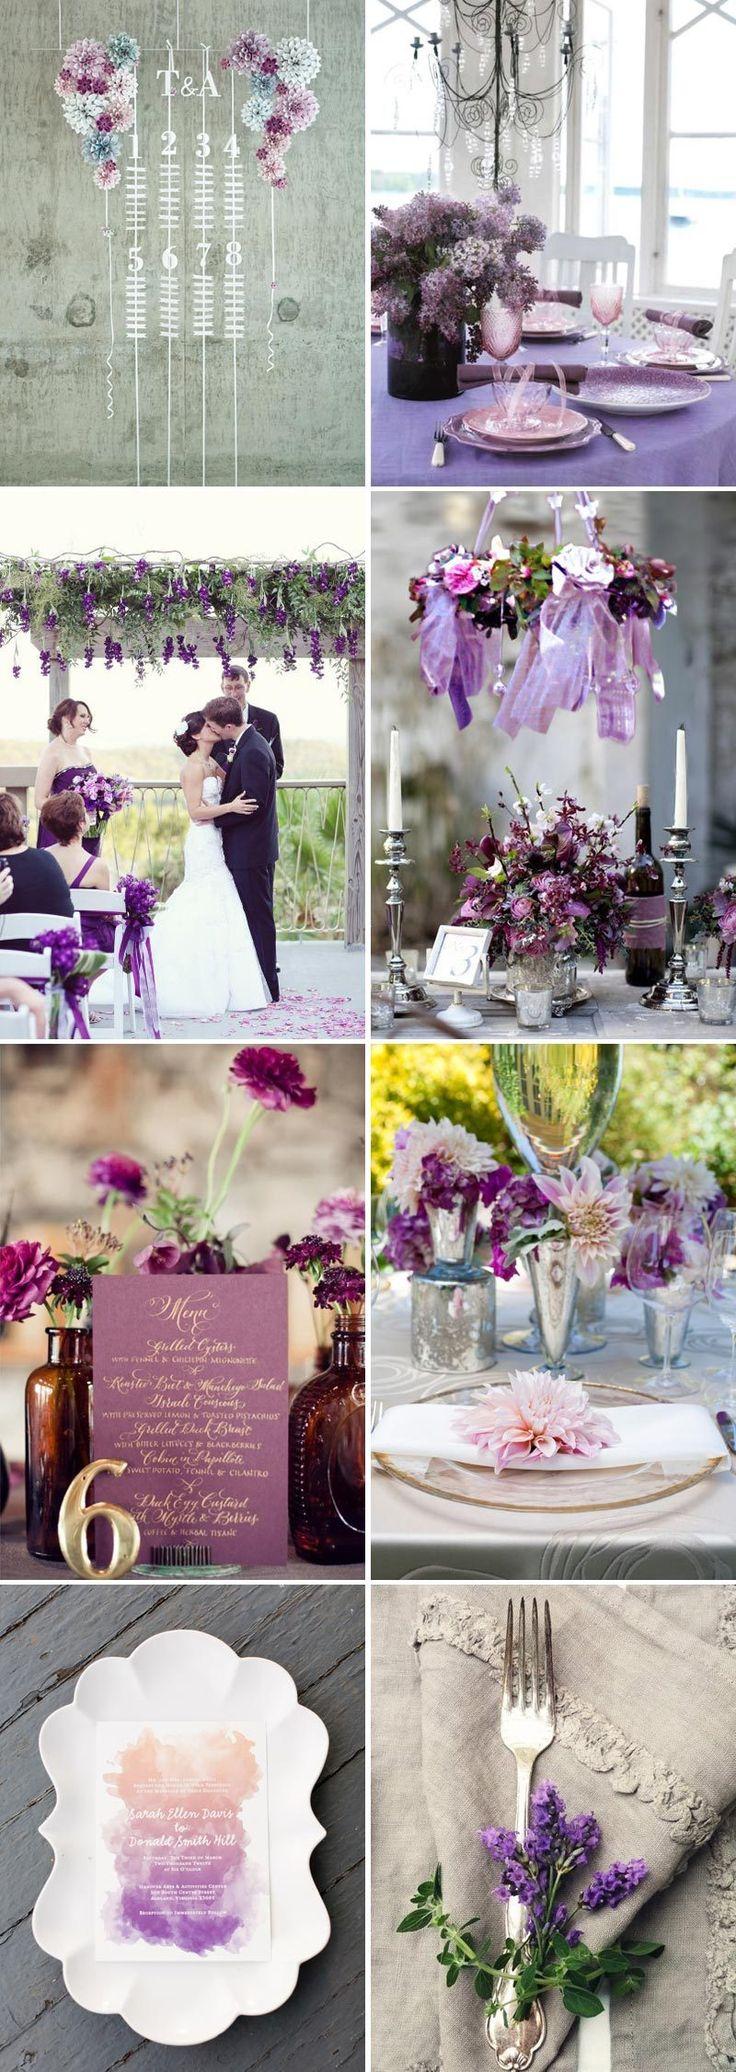 Lavender Hue into your groomsmen. http://roxyheartvintage.com